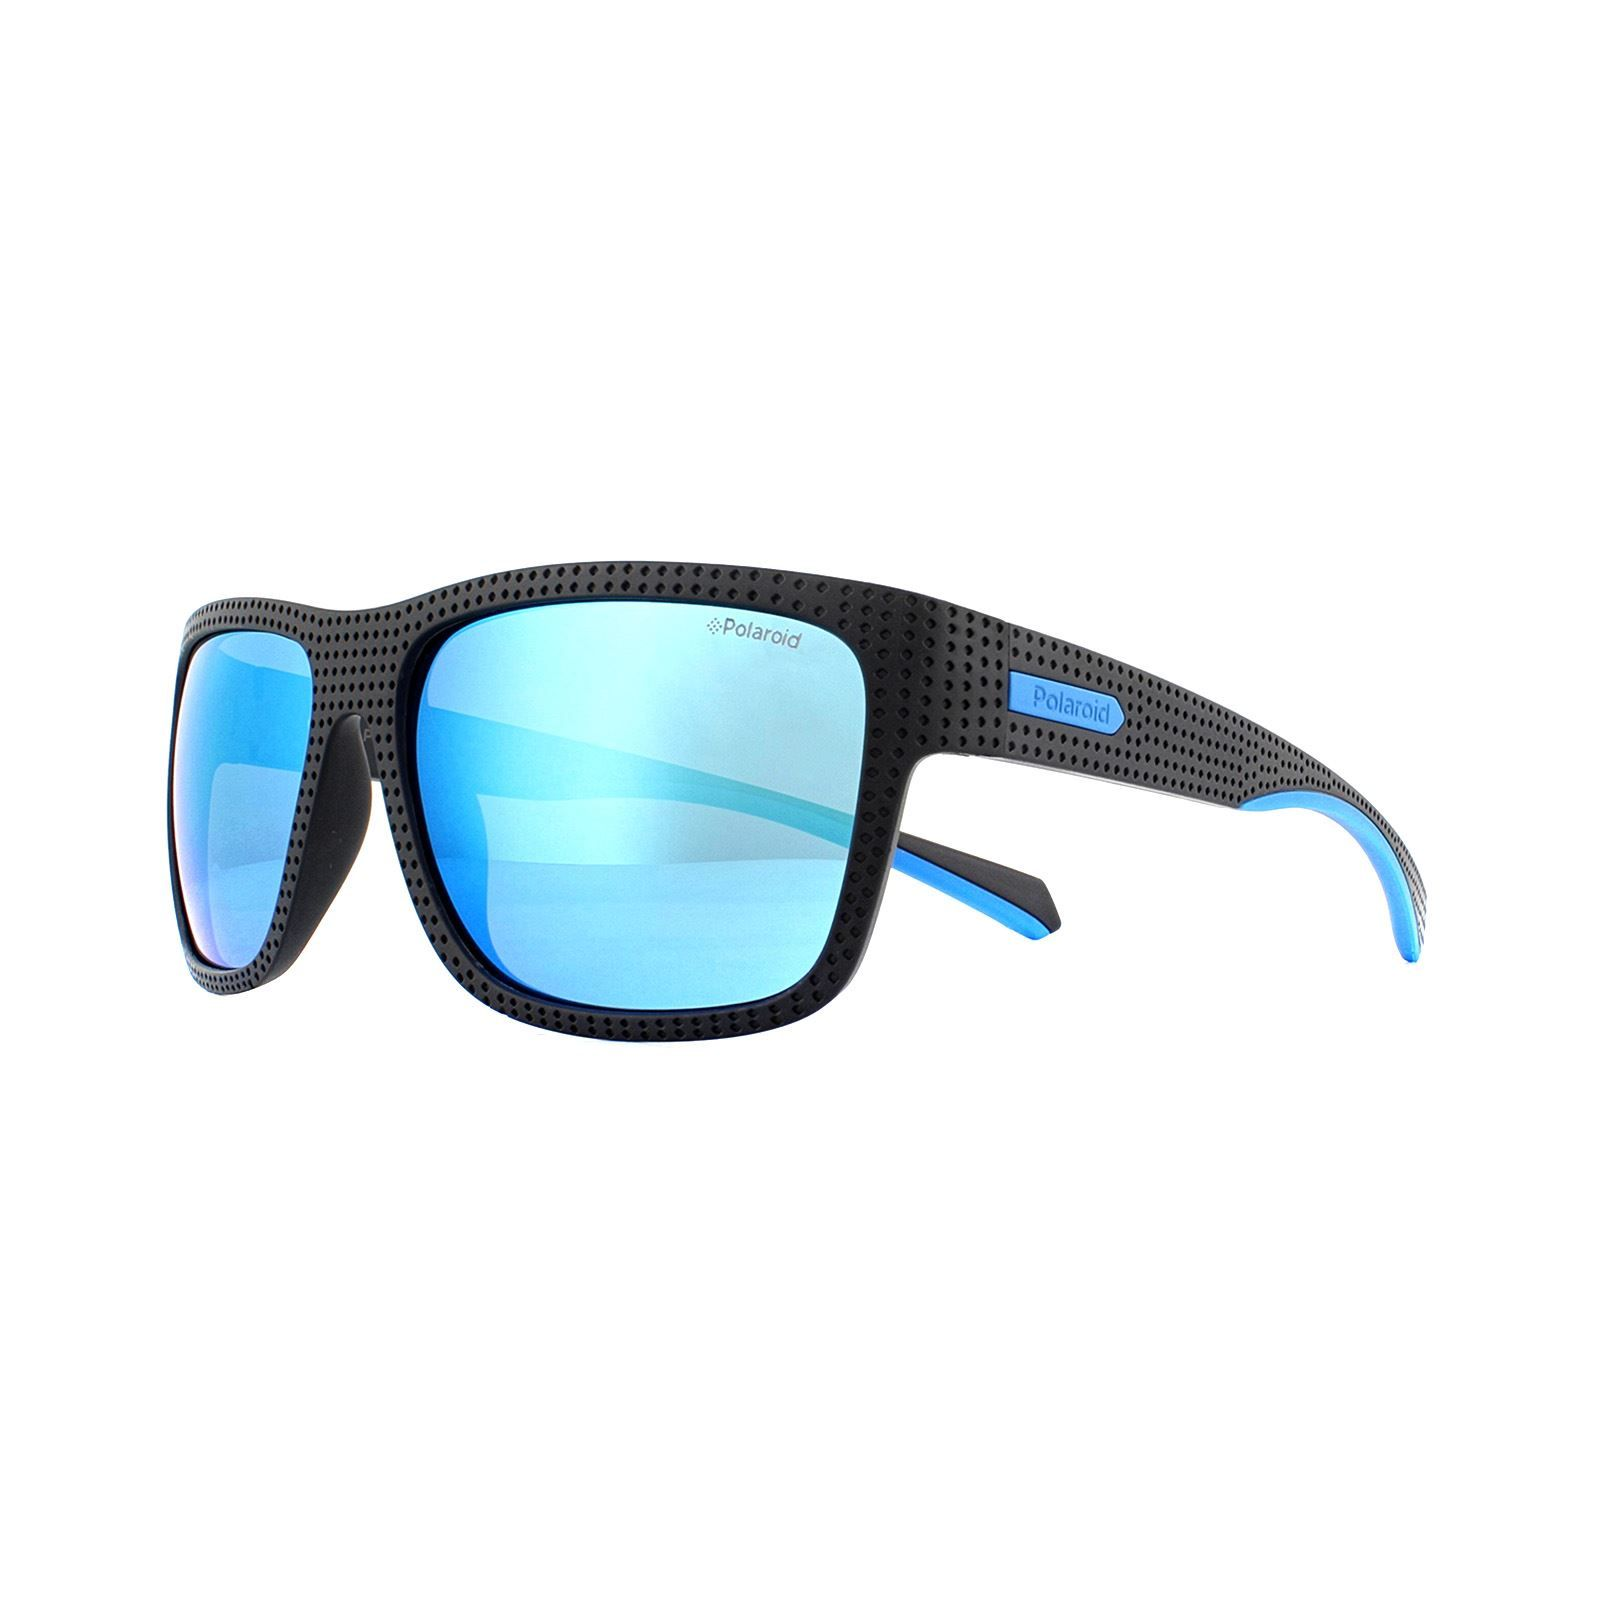 Polaroid Sport Sunglasses 7025/S EL9 5X Black Blue Mirror Polarized